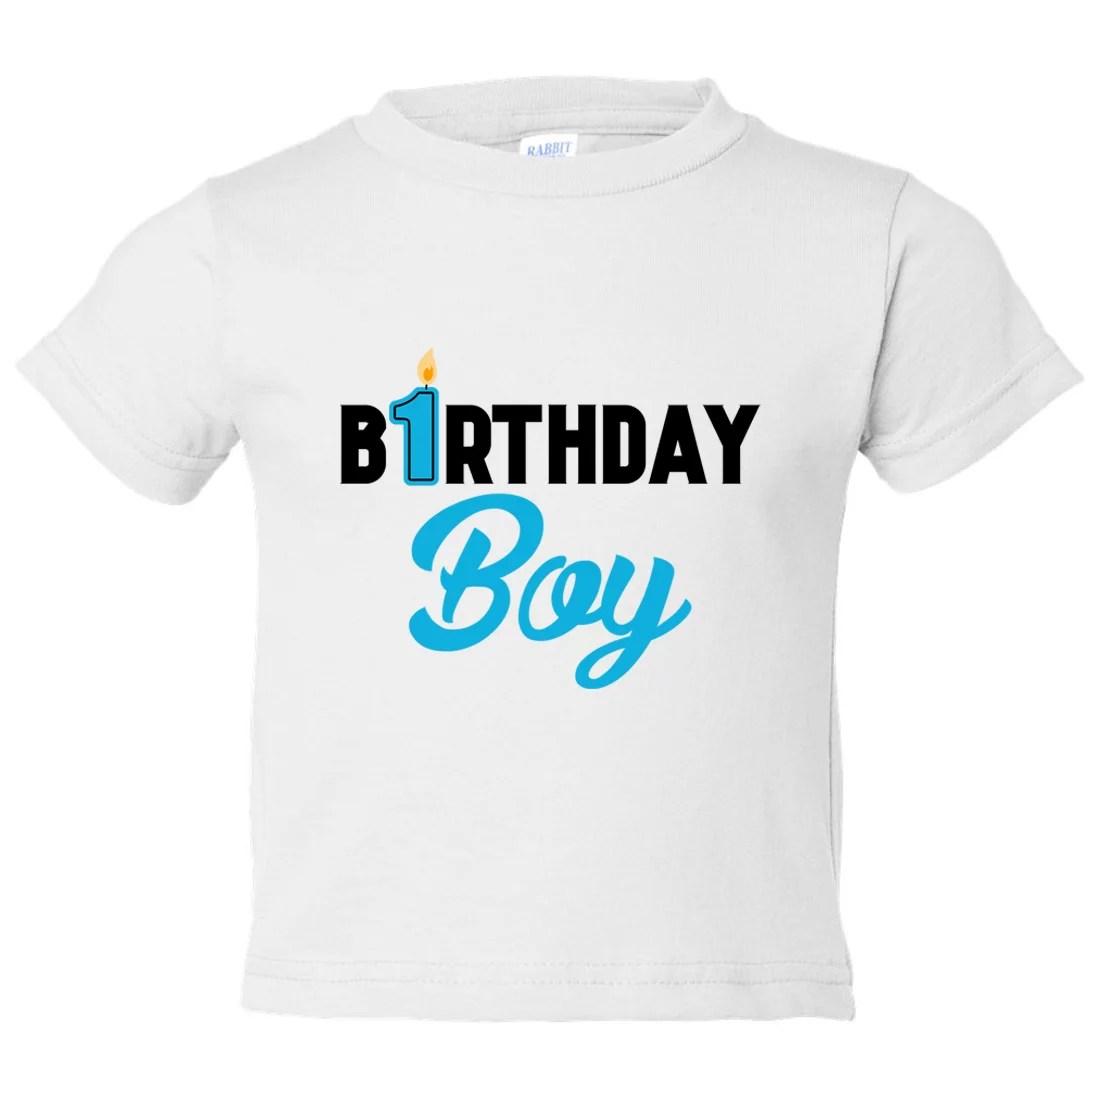 Funny Threadz Boys 1 Year Old Birthday Boy Toddler Shirt Birthday Candle Funny Threadz Kids White Medium 10 12 Youth Walmart Com Walmart Com